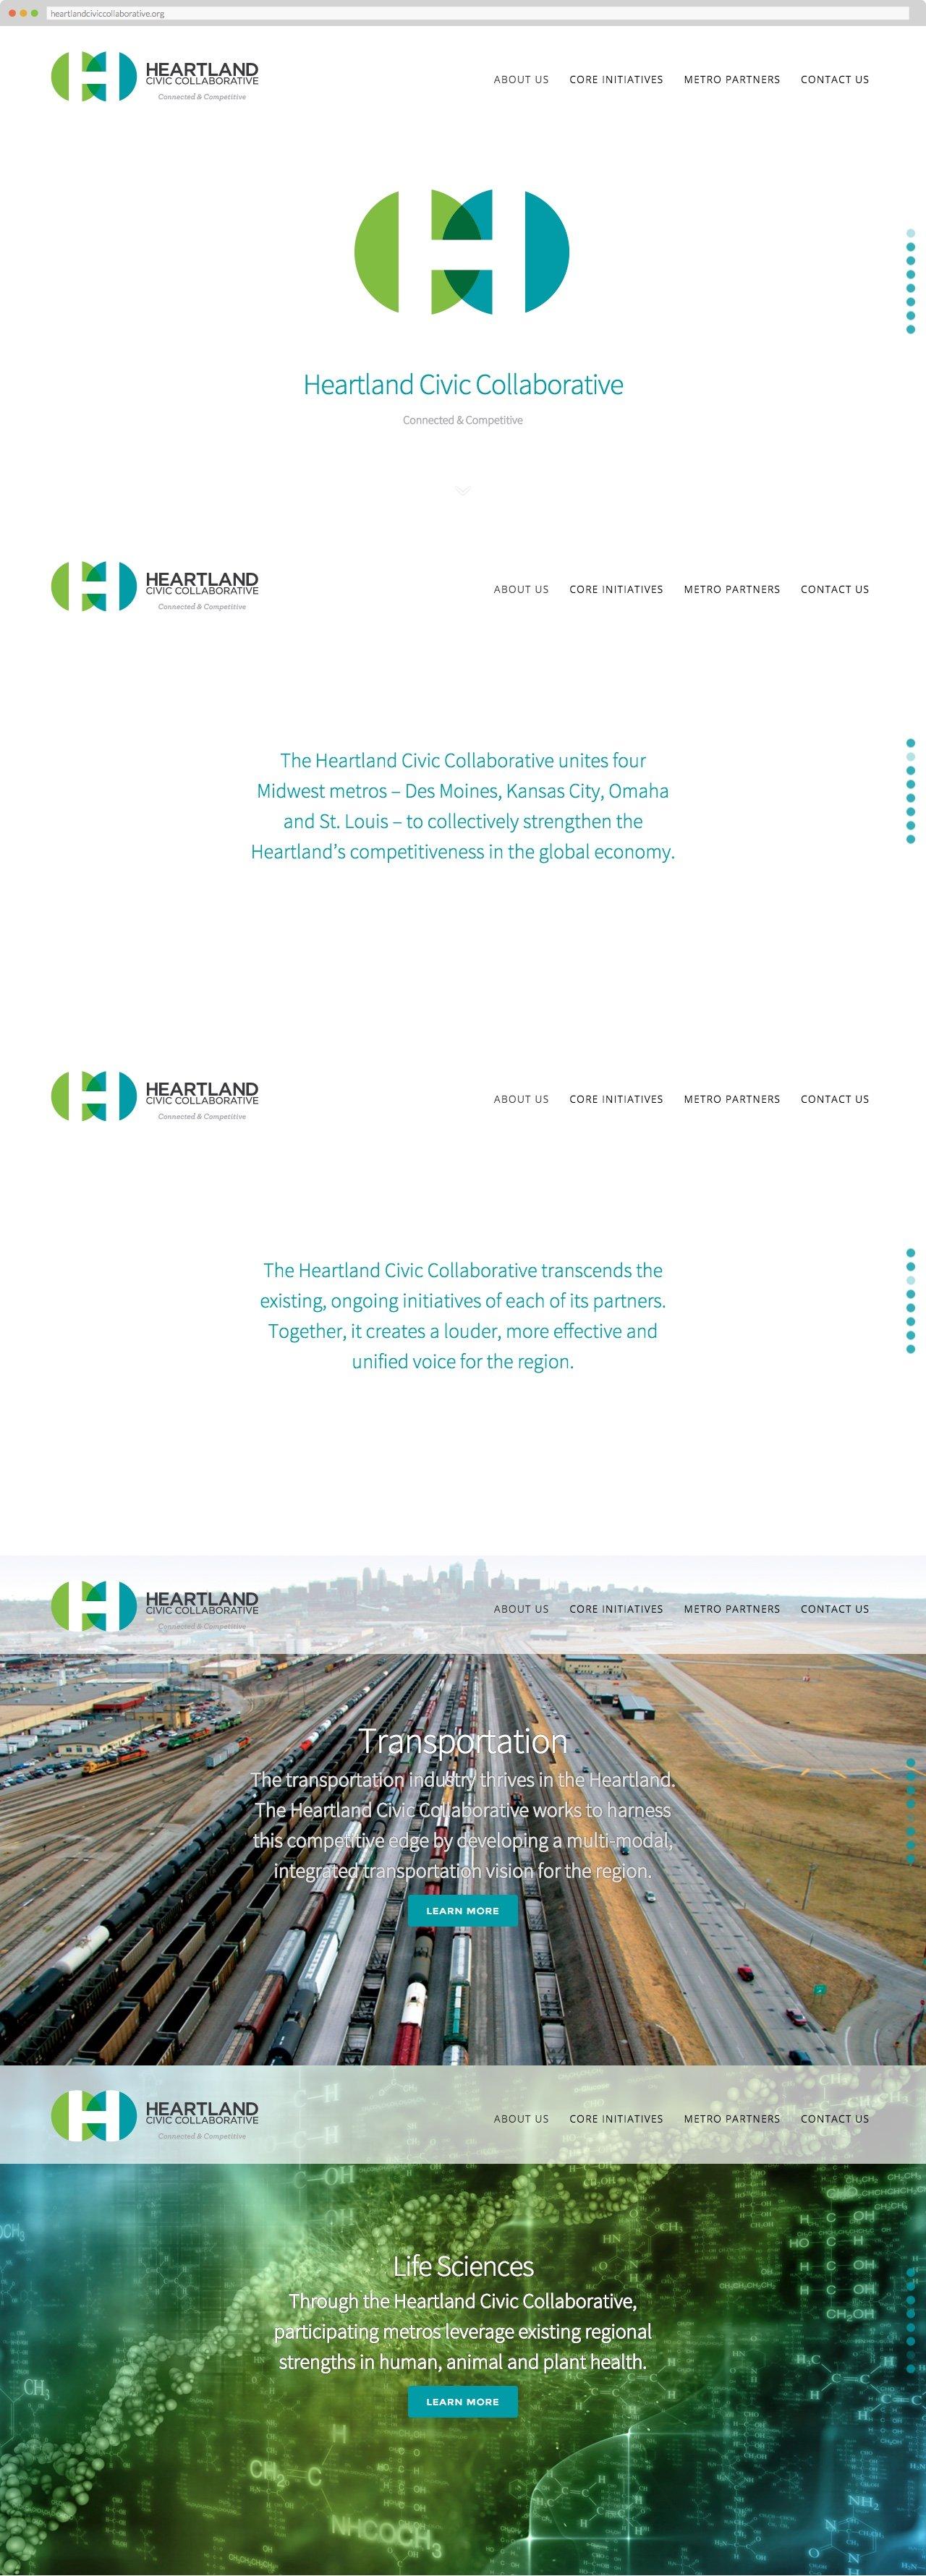 Heartland Civic Collaborative, homepage